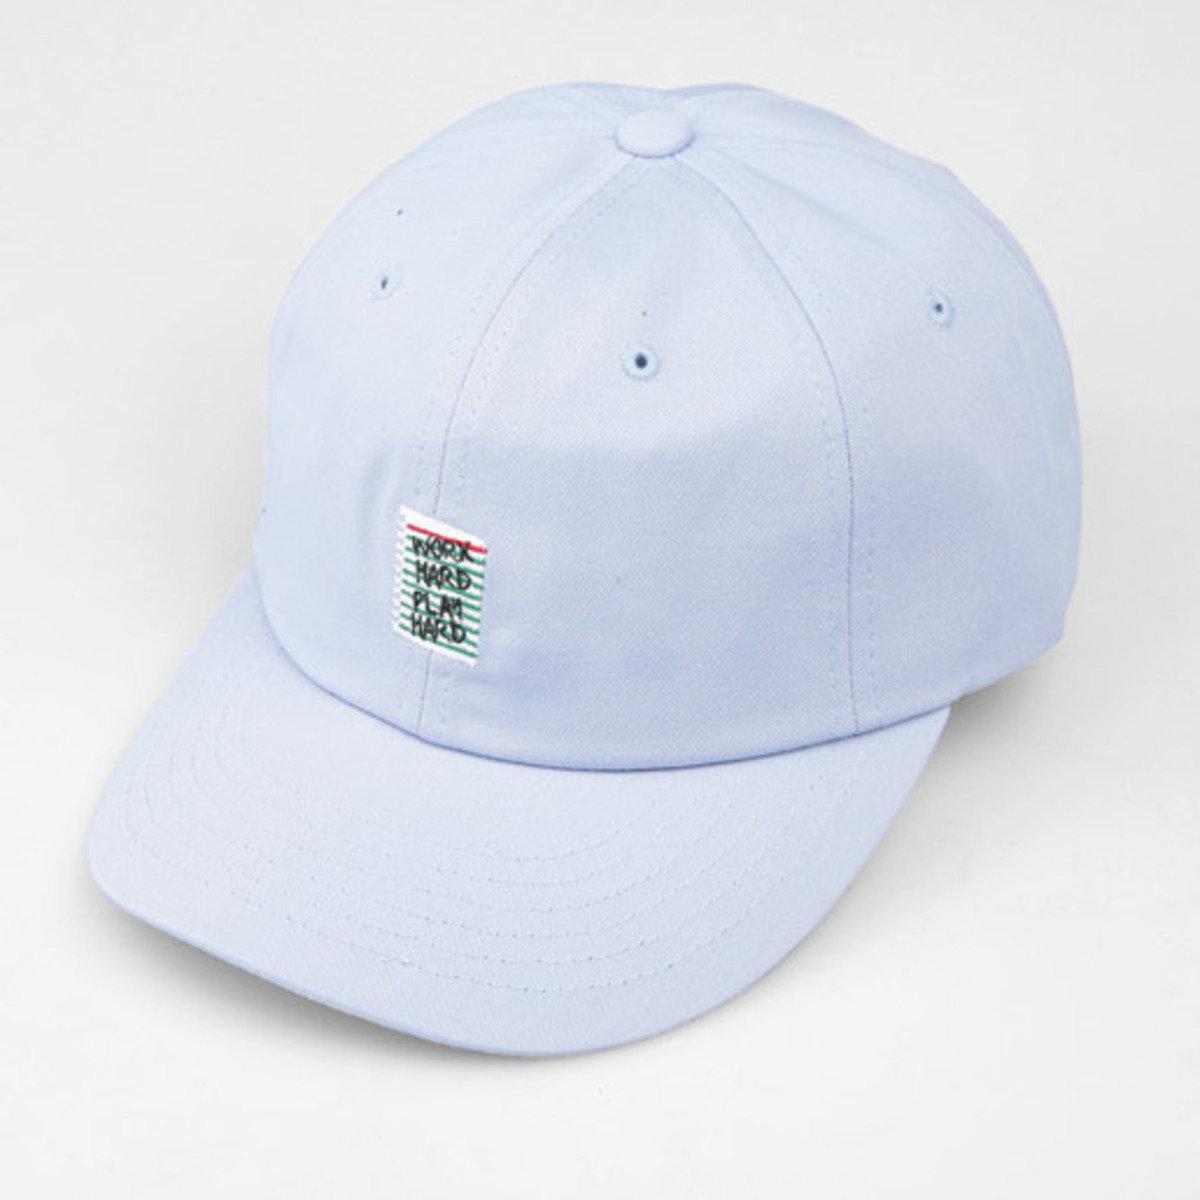 Play hard棒球帽_CA1_160219713